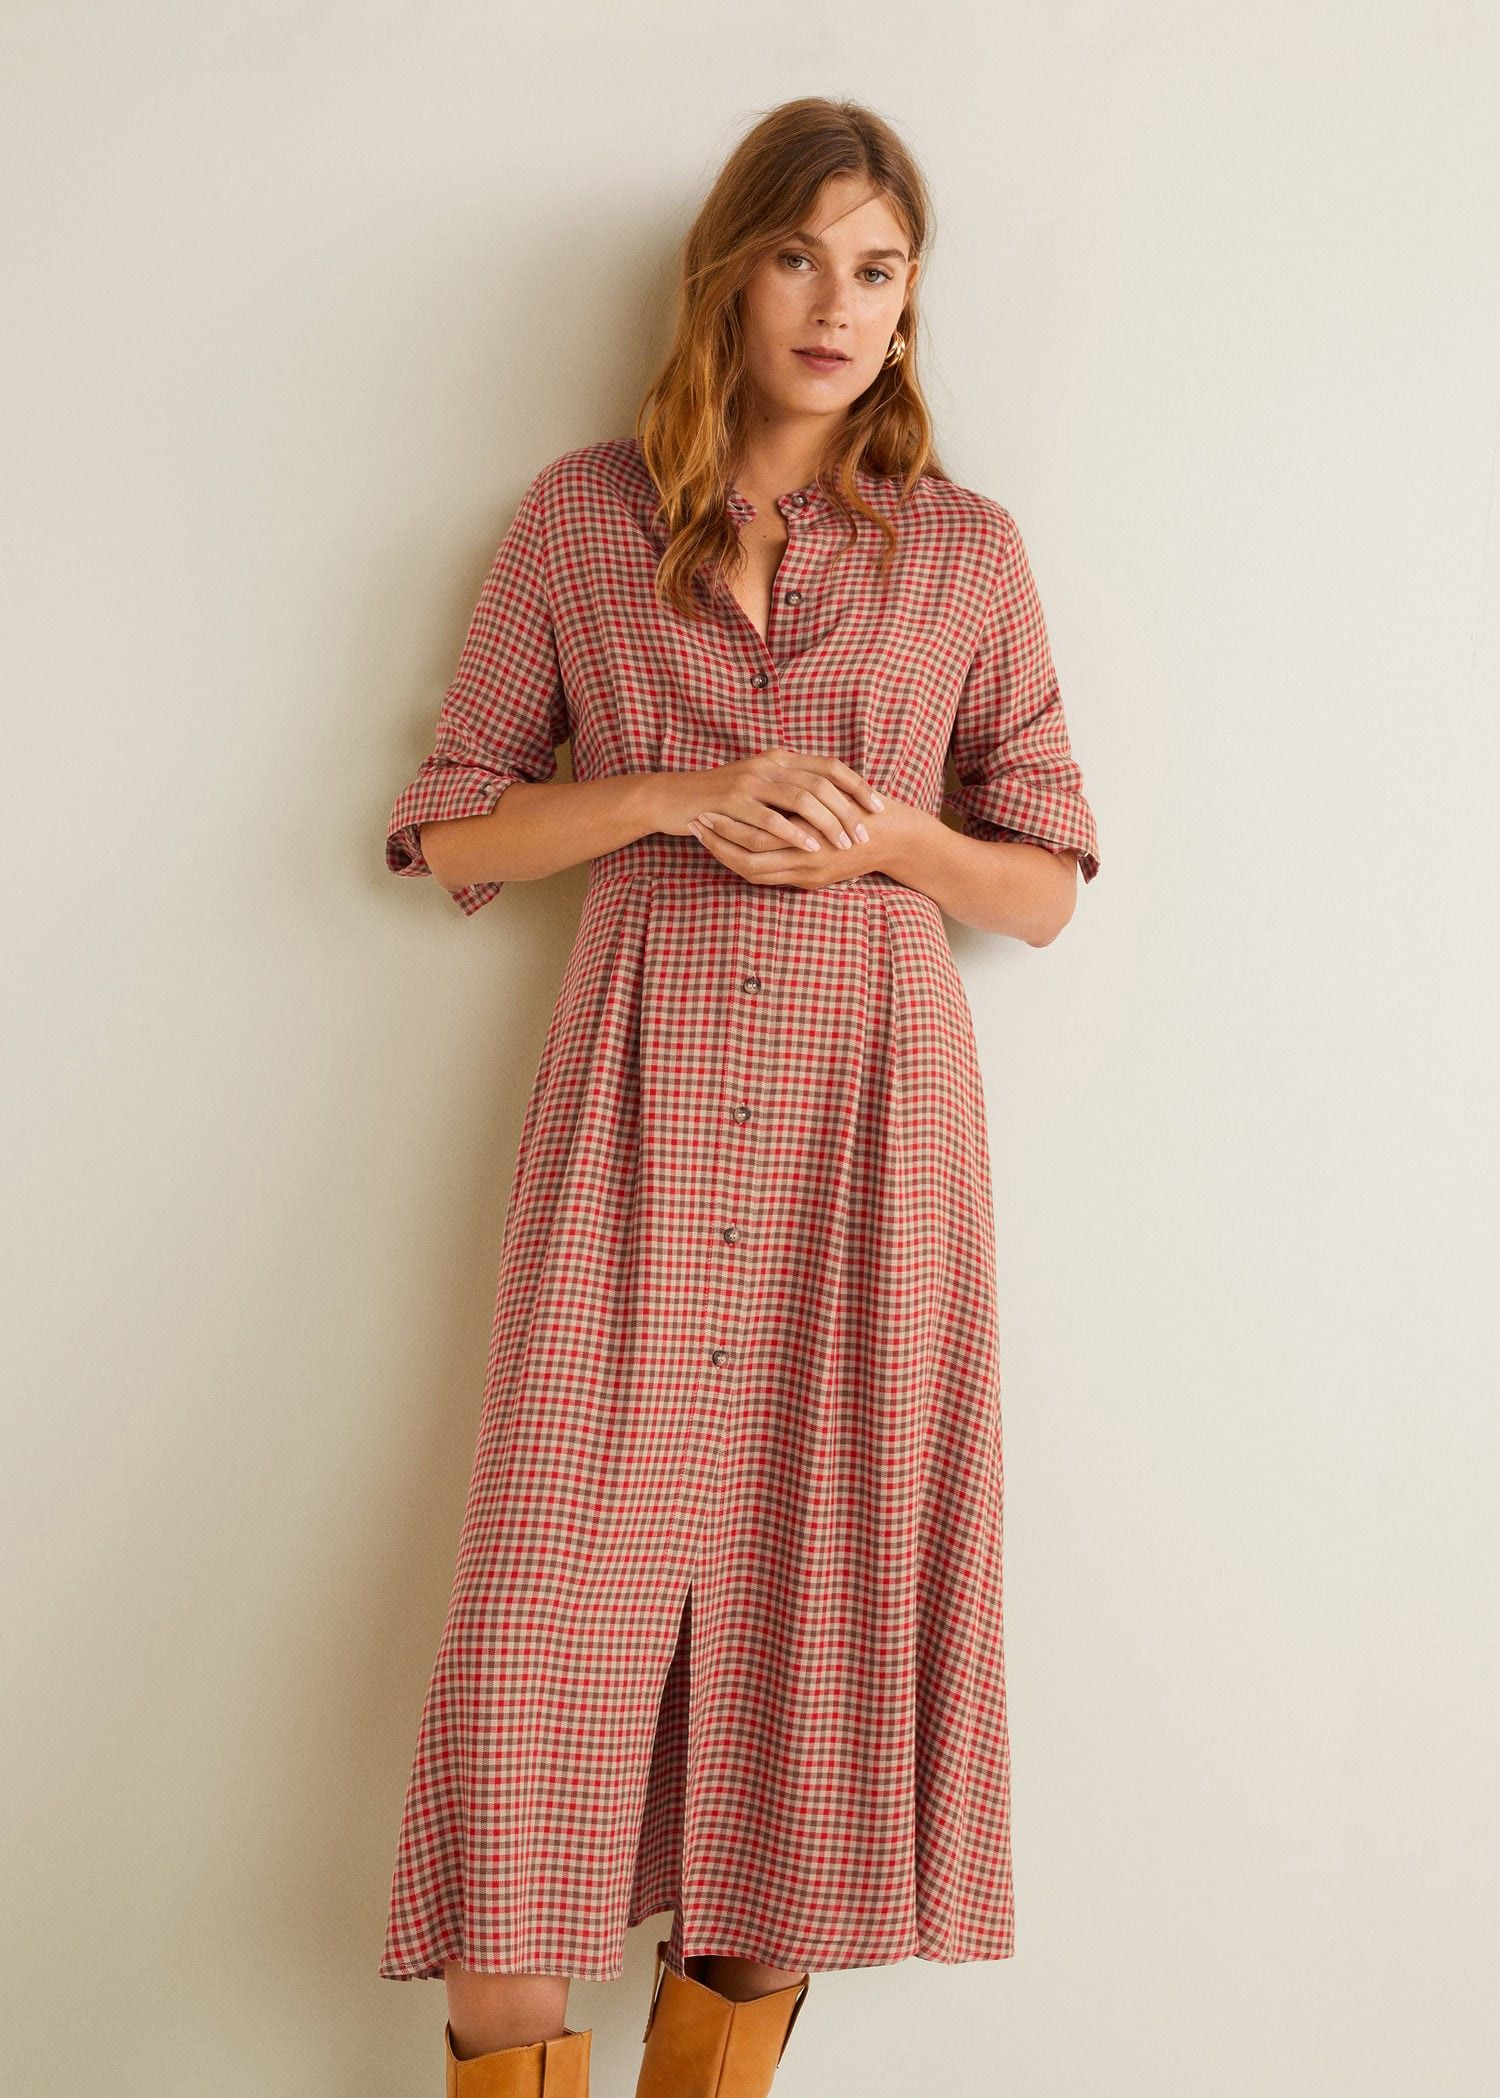 Checked linen dress by Mango  e0c712aca